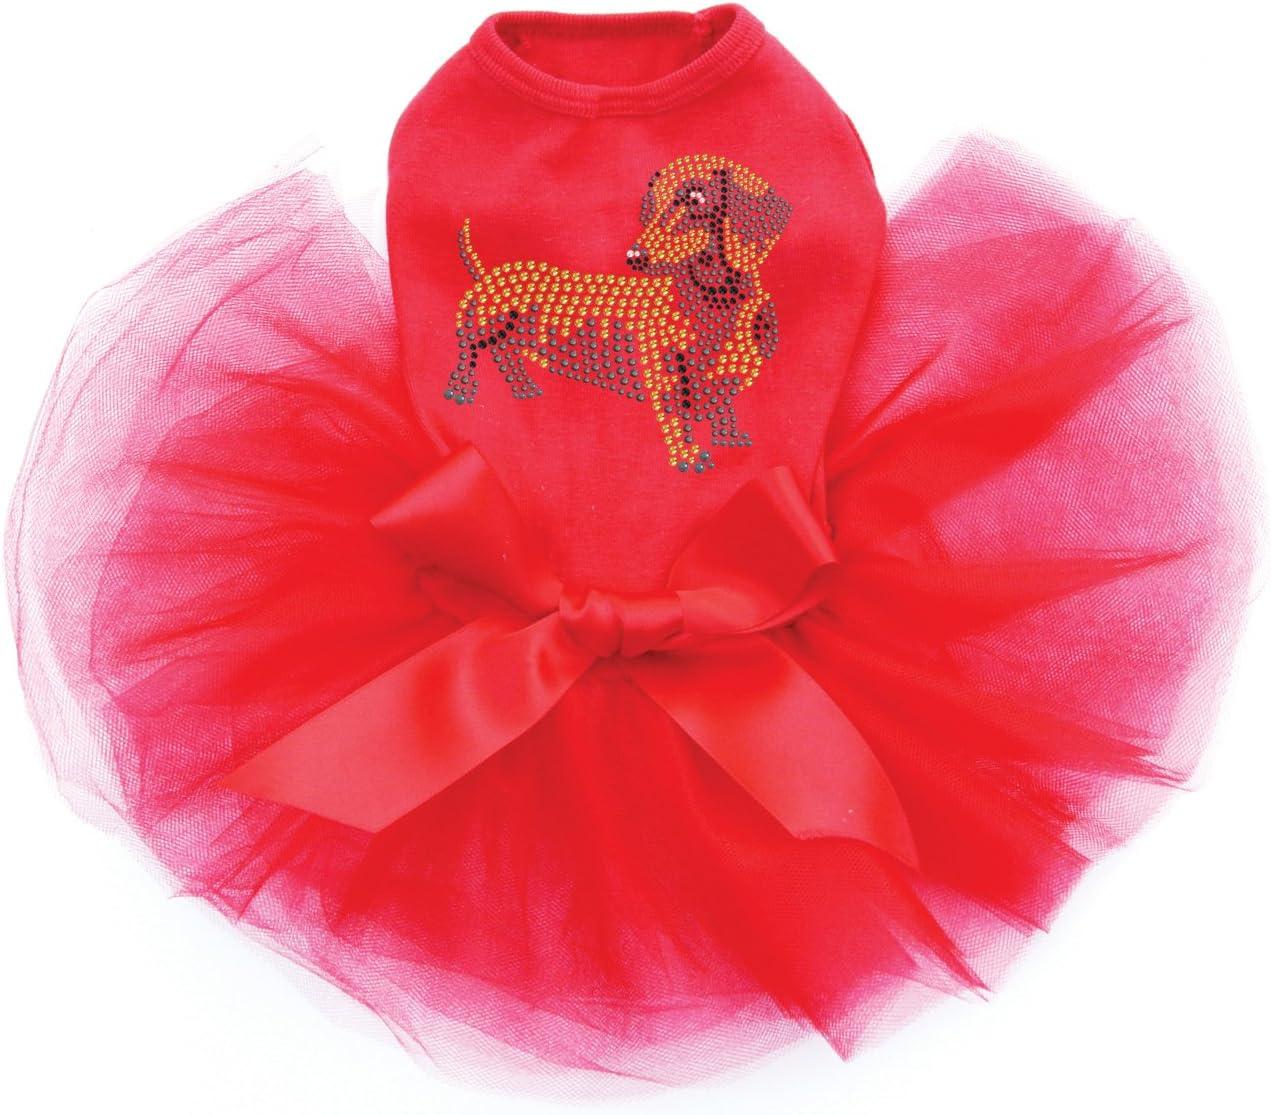 Dachshund Factory outlet # 2 Bling Rhinestone Dress overseas Dog Red Tutu M